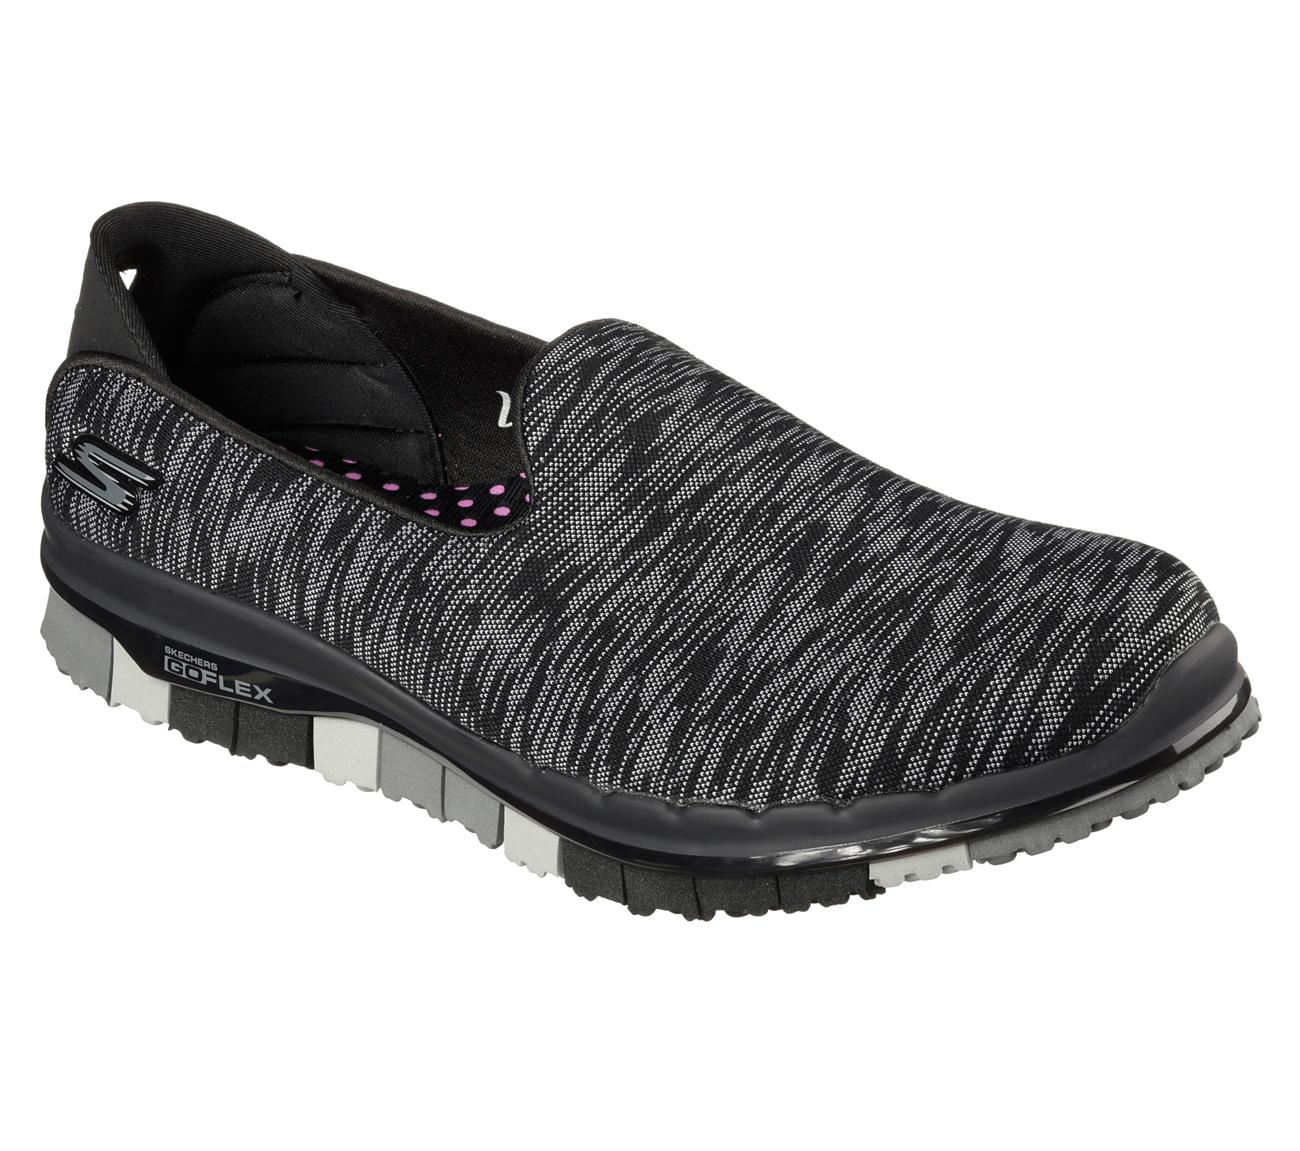 buy skechers skechers go flex walk ability skechers performance shoes only. Black Bedroom Furniture Sets. Home Design Ideas